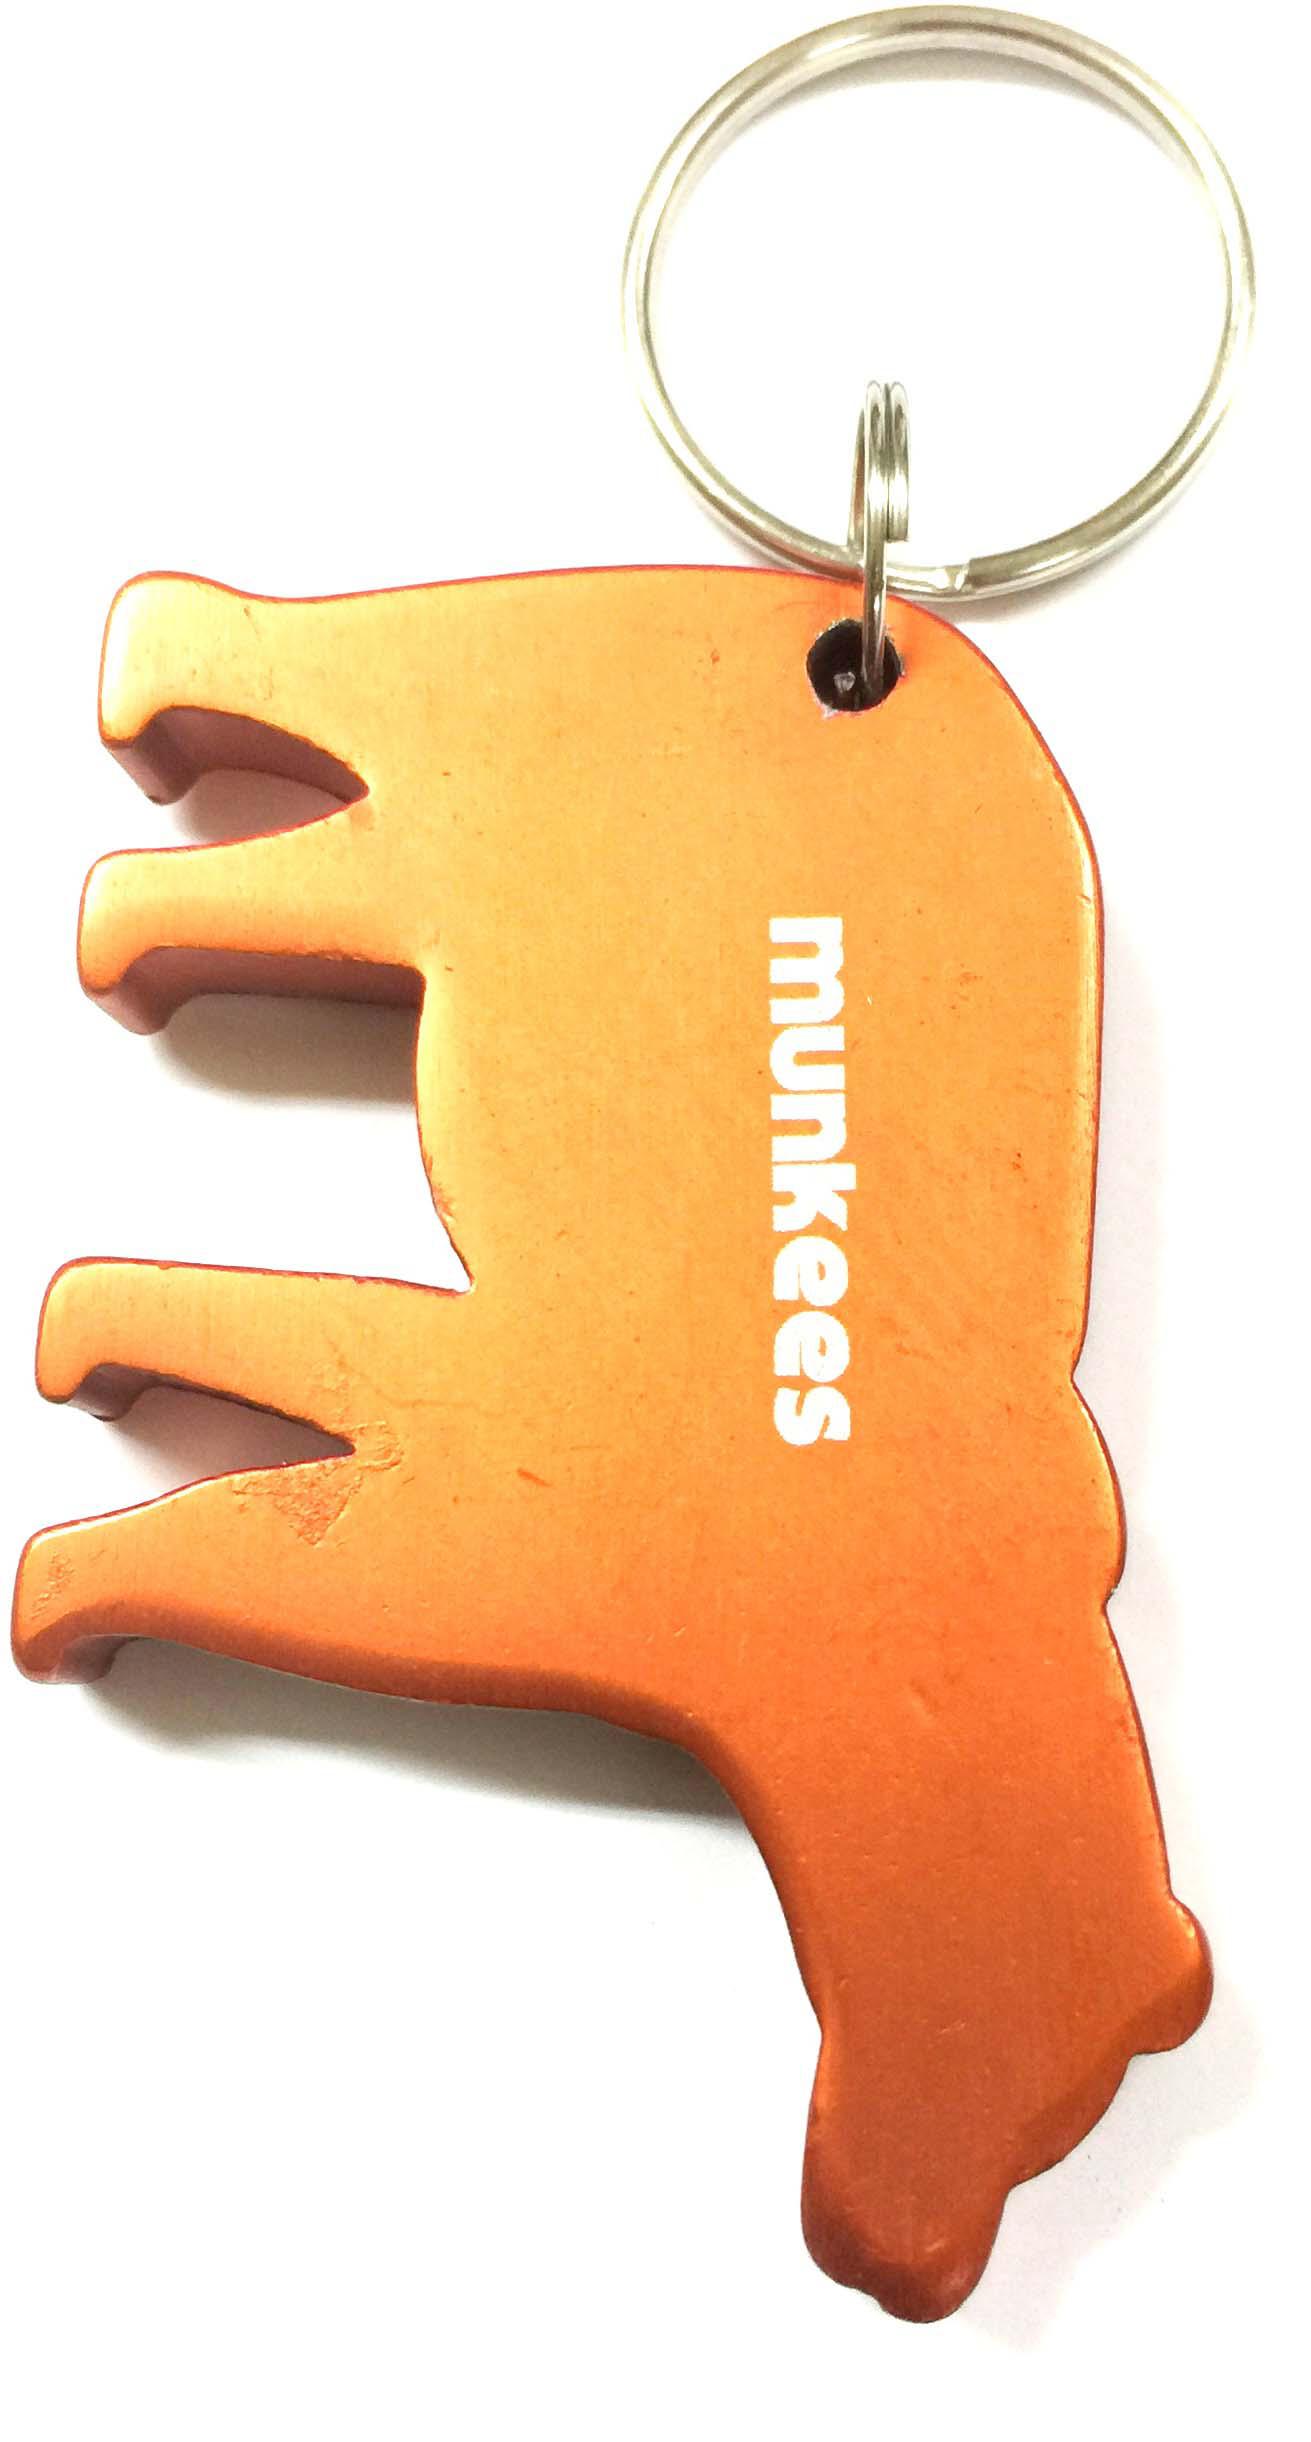 Брелок-открывалка Munkees Медведь, цвет: оранжевый брелок открывалка munkees стандартная цвет желтый